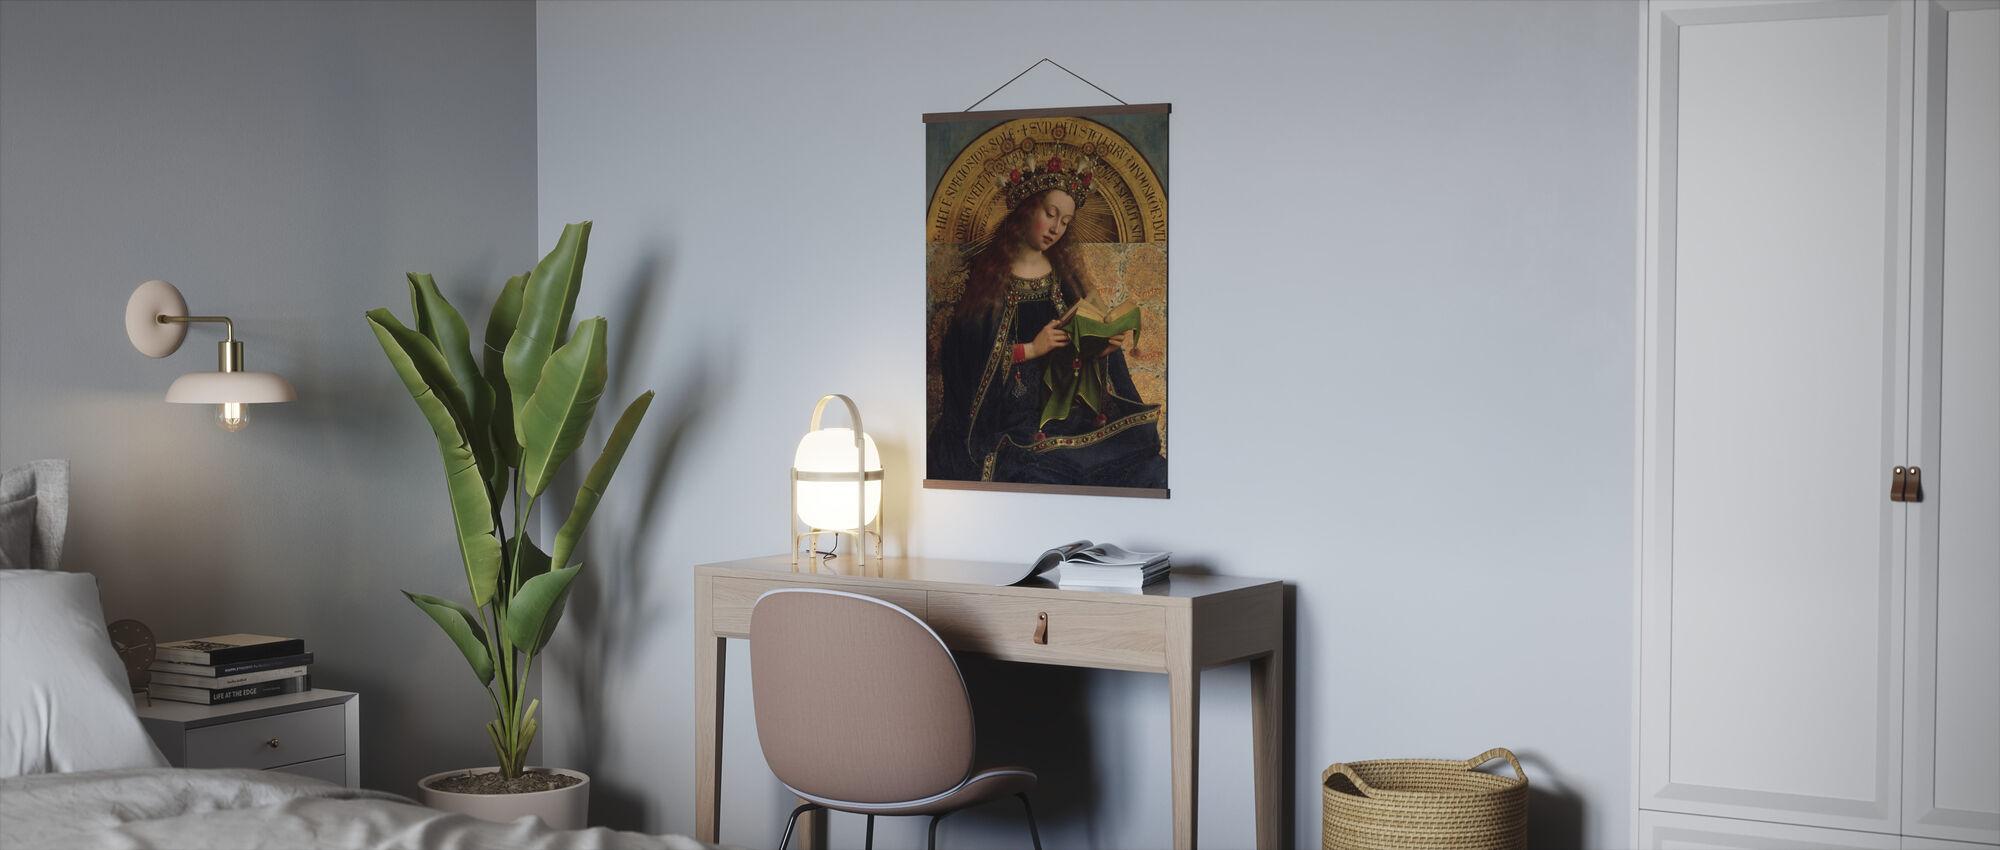 Virgin Mary - Hubert Eyck - Poster - Office